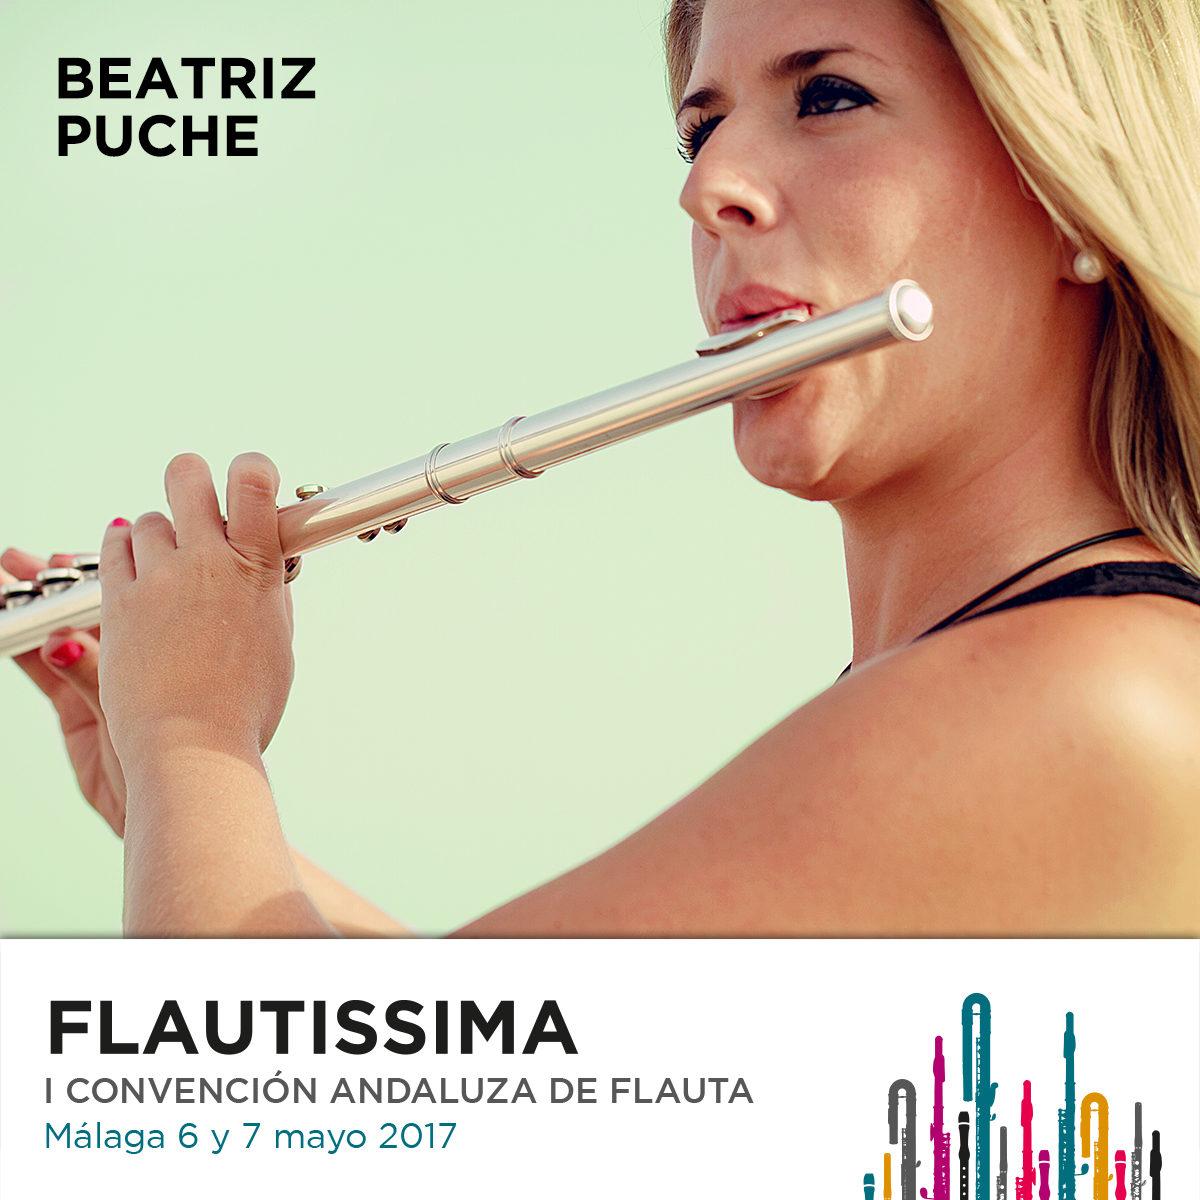 Beatriz Puche Flautissima